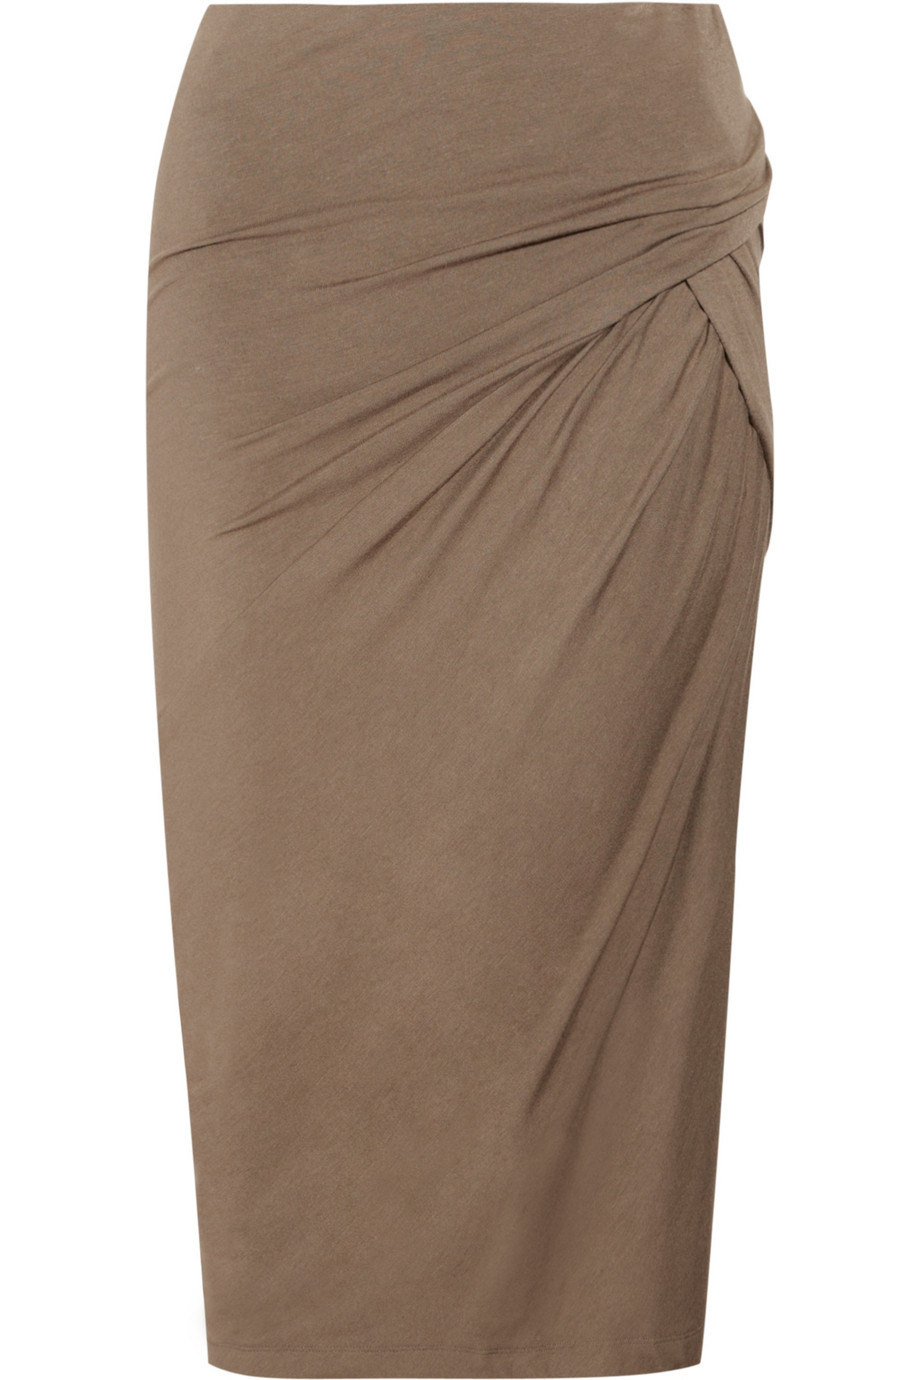 donna karan stretch jersey pencil skirt in brown lyst